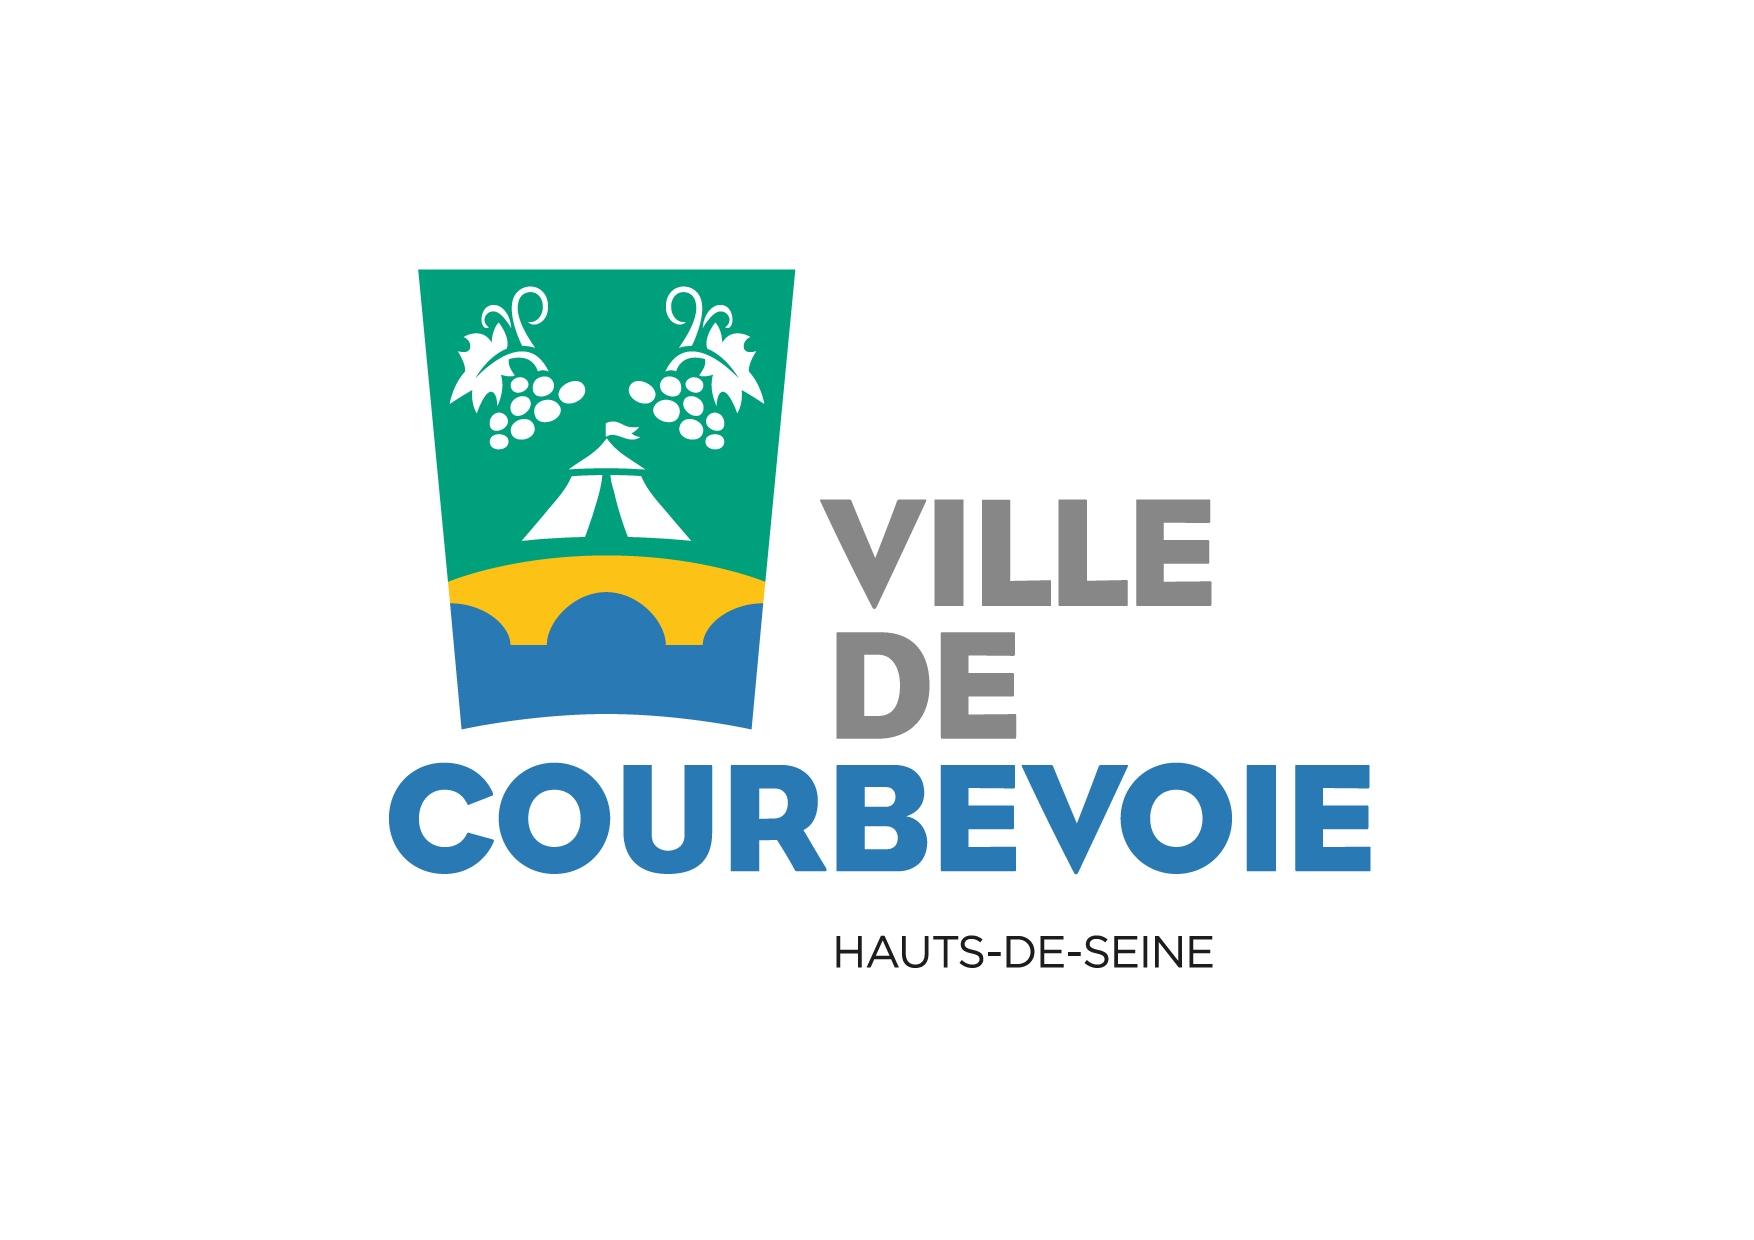 Stadt Courbevoie